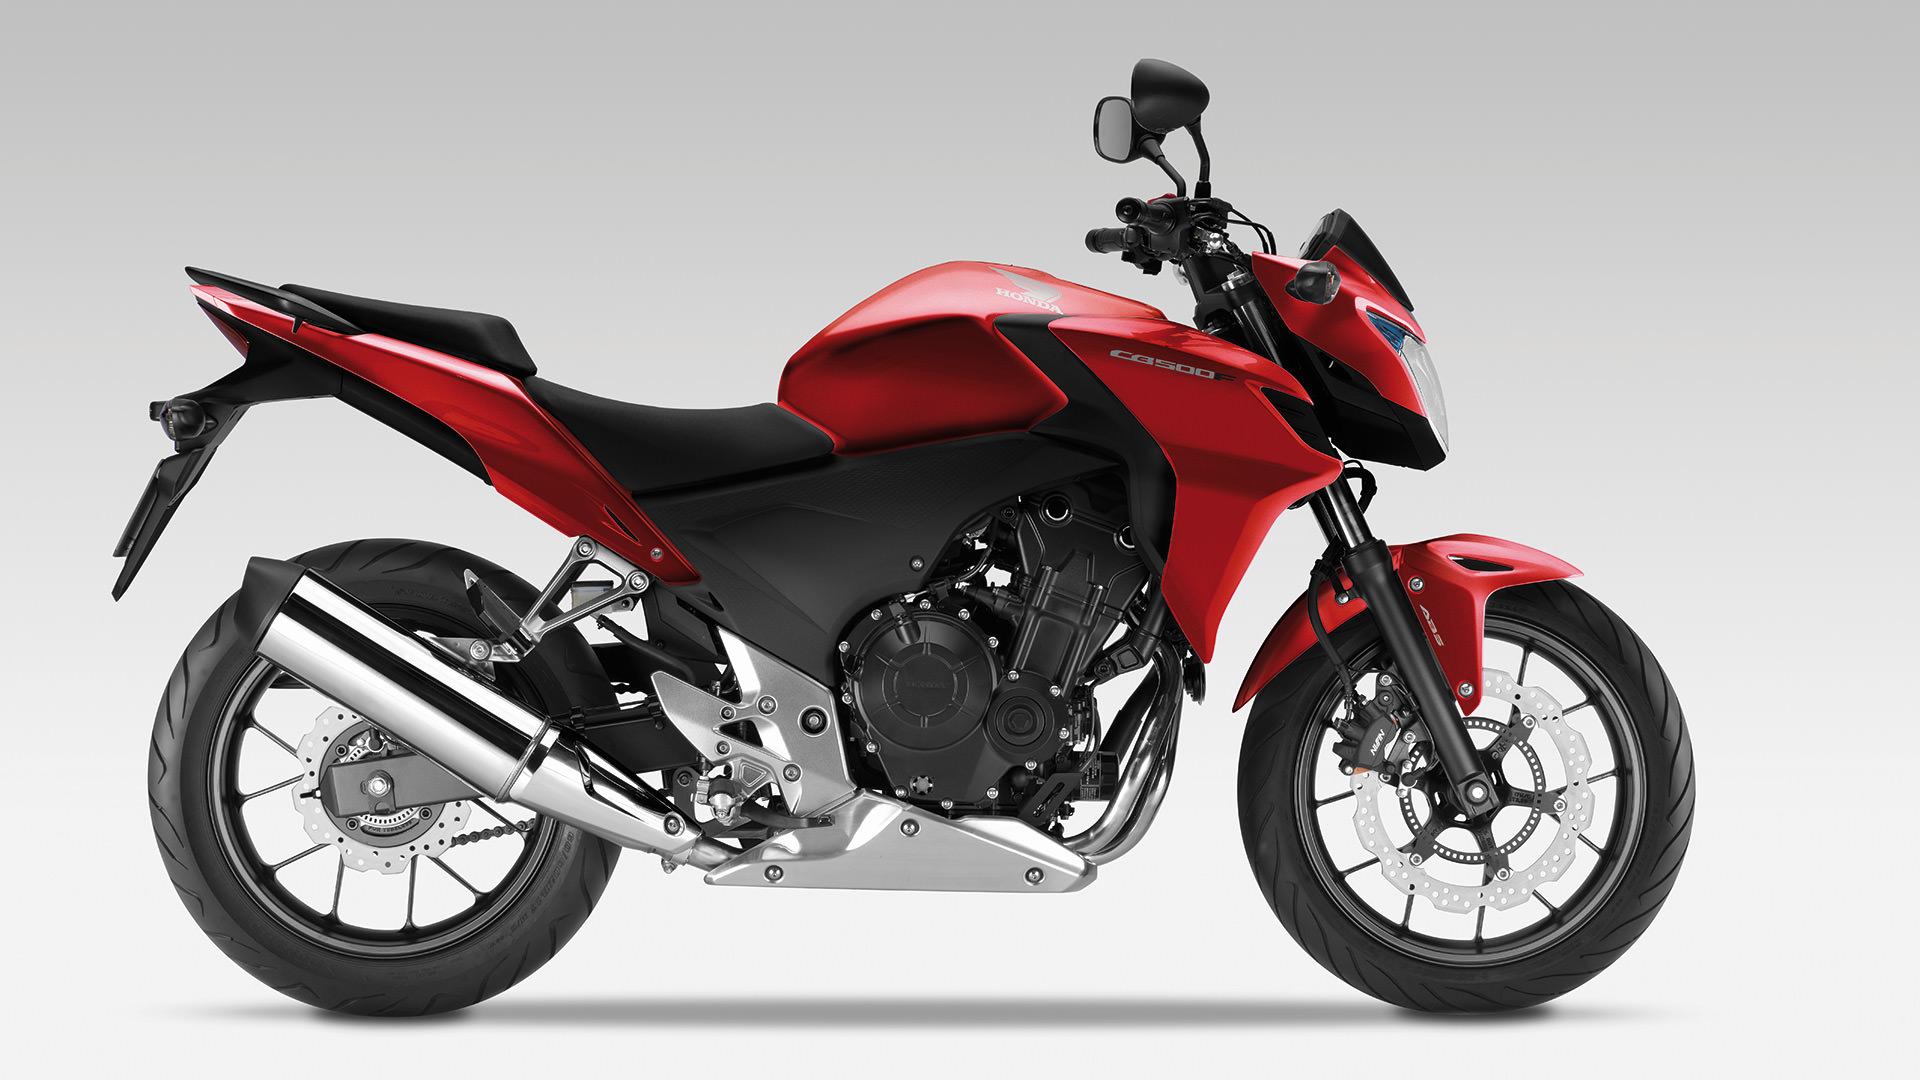 Honda CB500F Review / Specs - Naked CBR Sport Bike StreetFighter Motorcycle Horsepower, Torque, MPG, Price